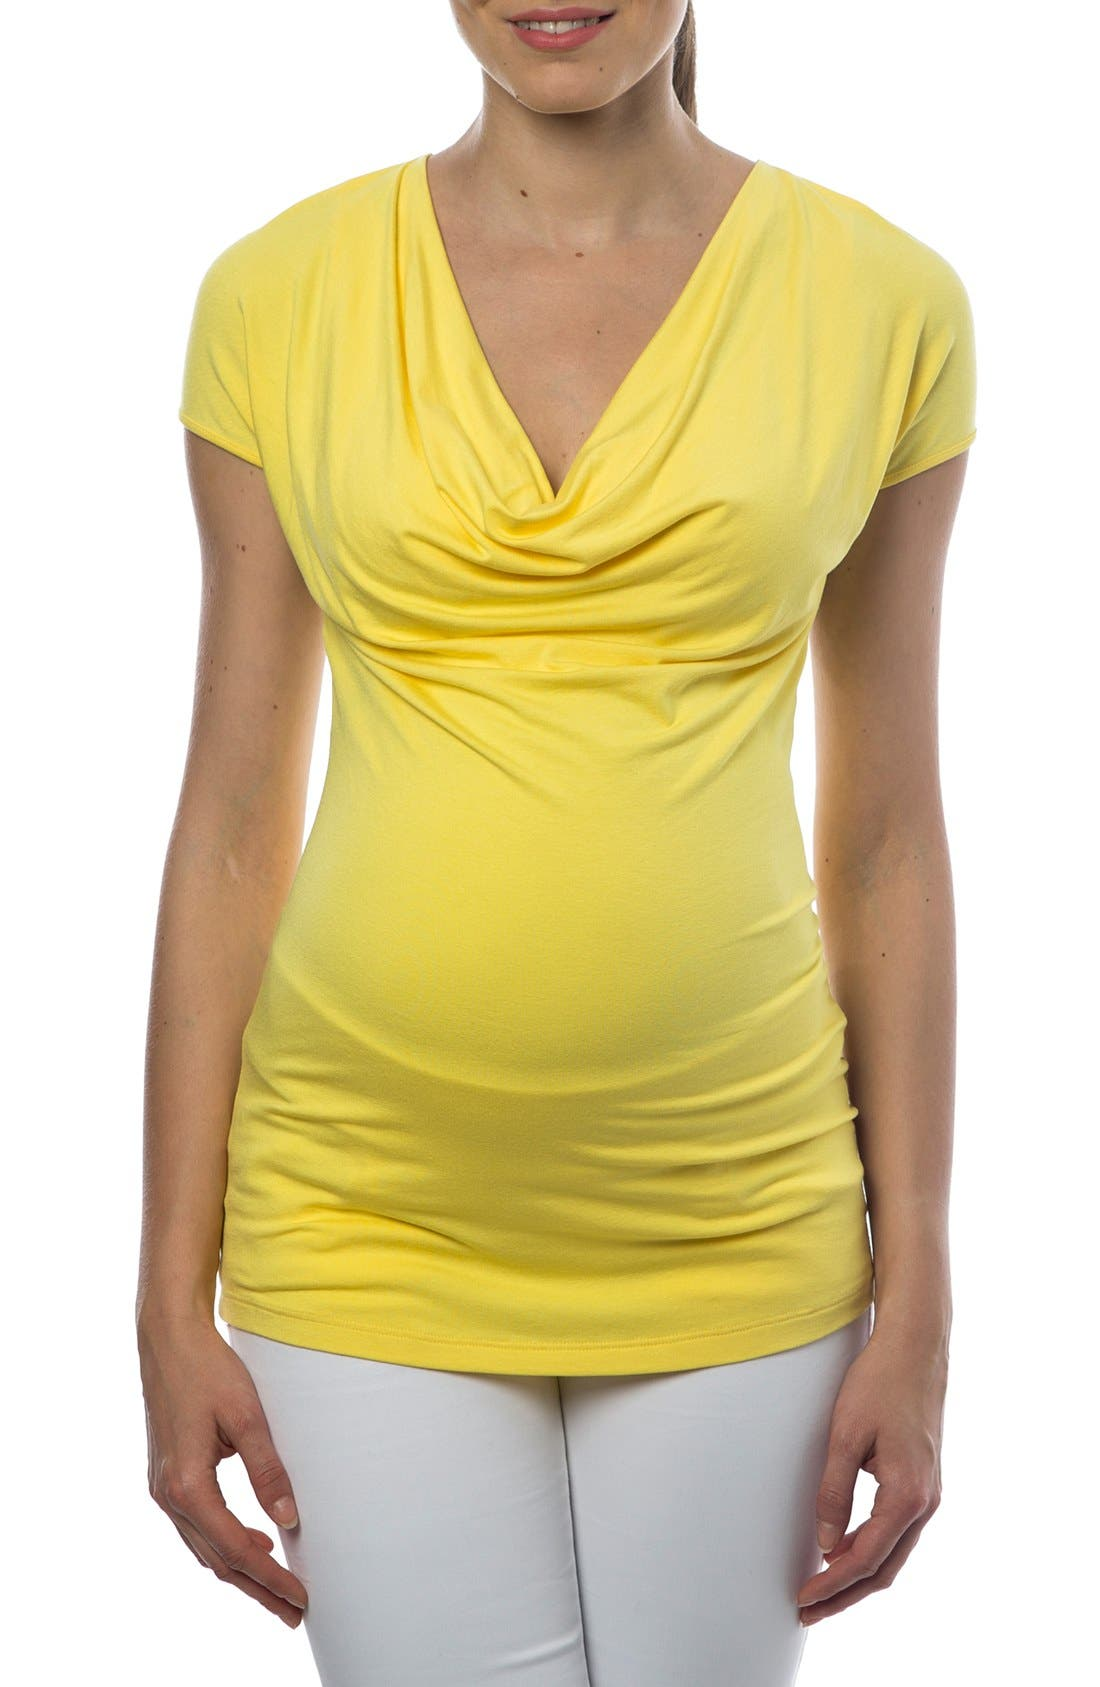 PIETRO BRUNELLI 'Ginestra' Cowl Neck Maternity/Nursing Tunic